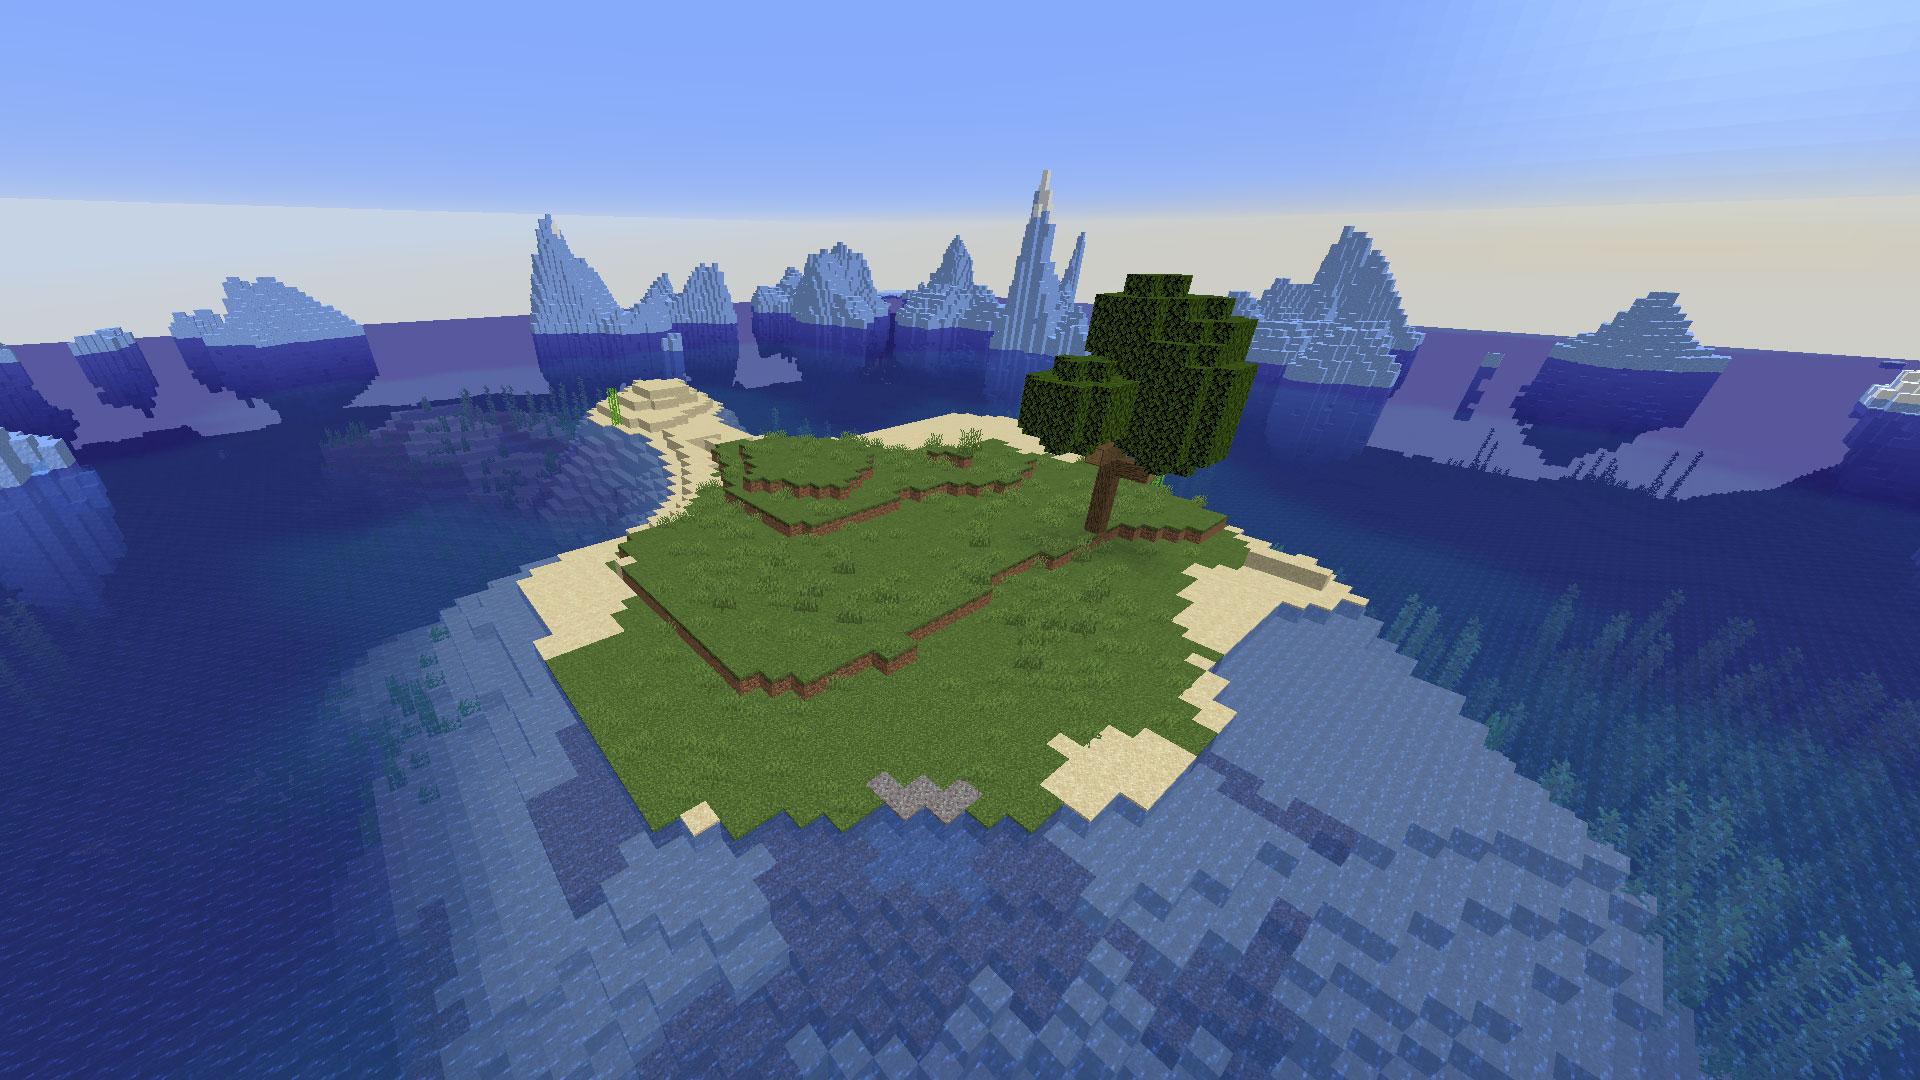 Minecraft Island Seeds (12) - All Platforms and Versions! - Pro